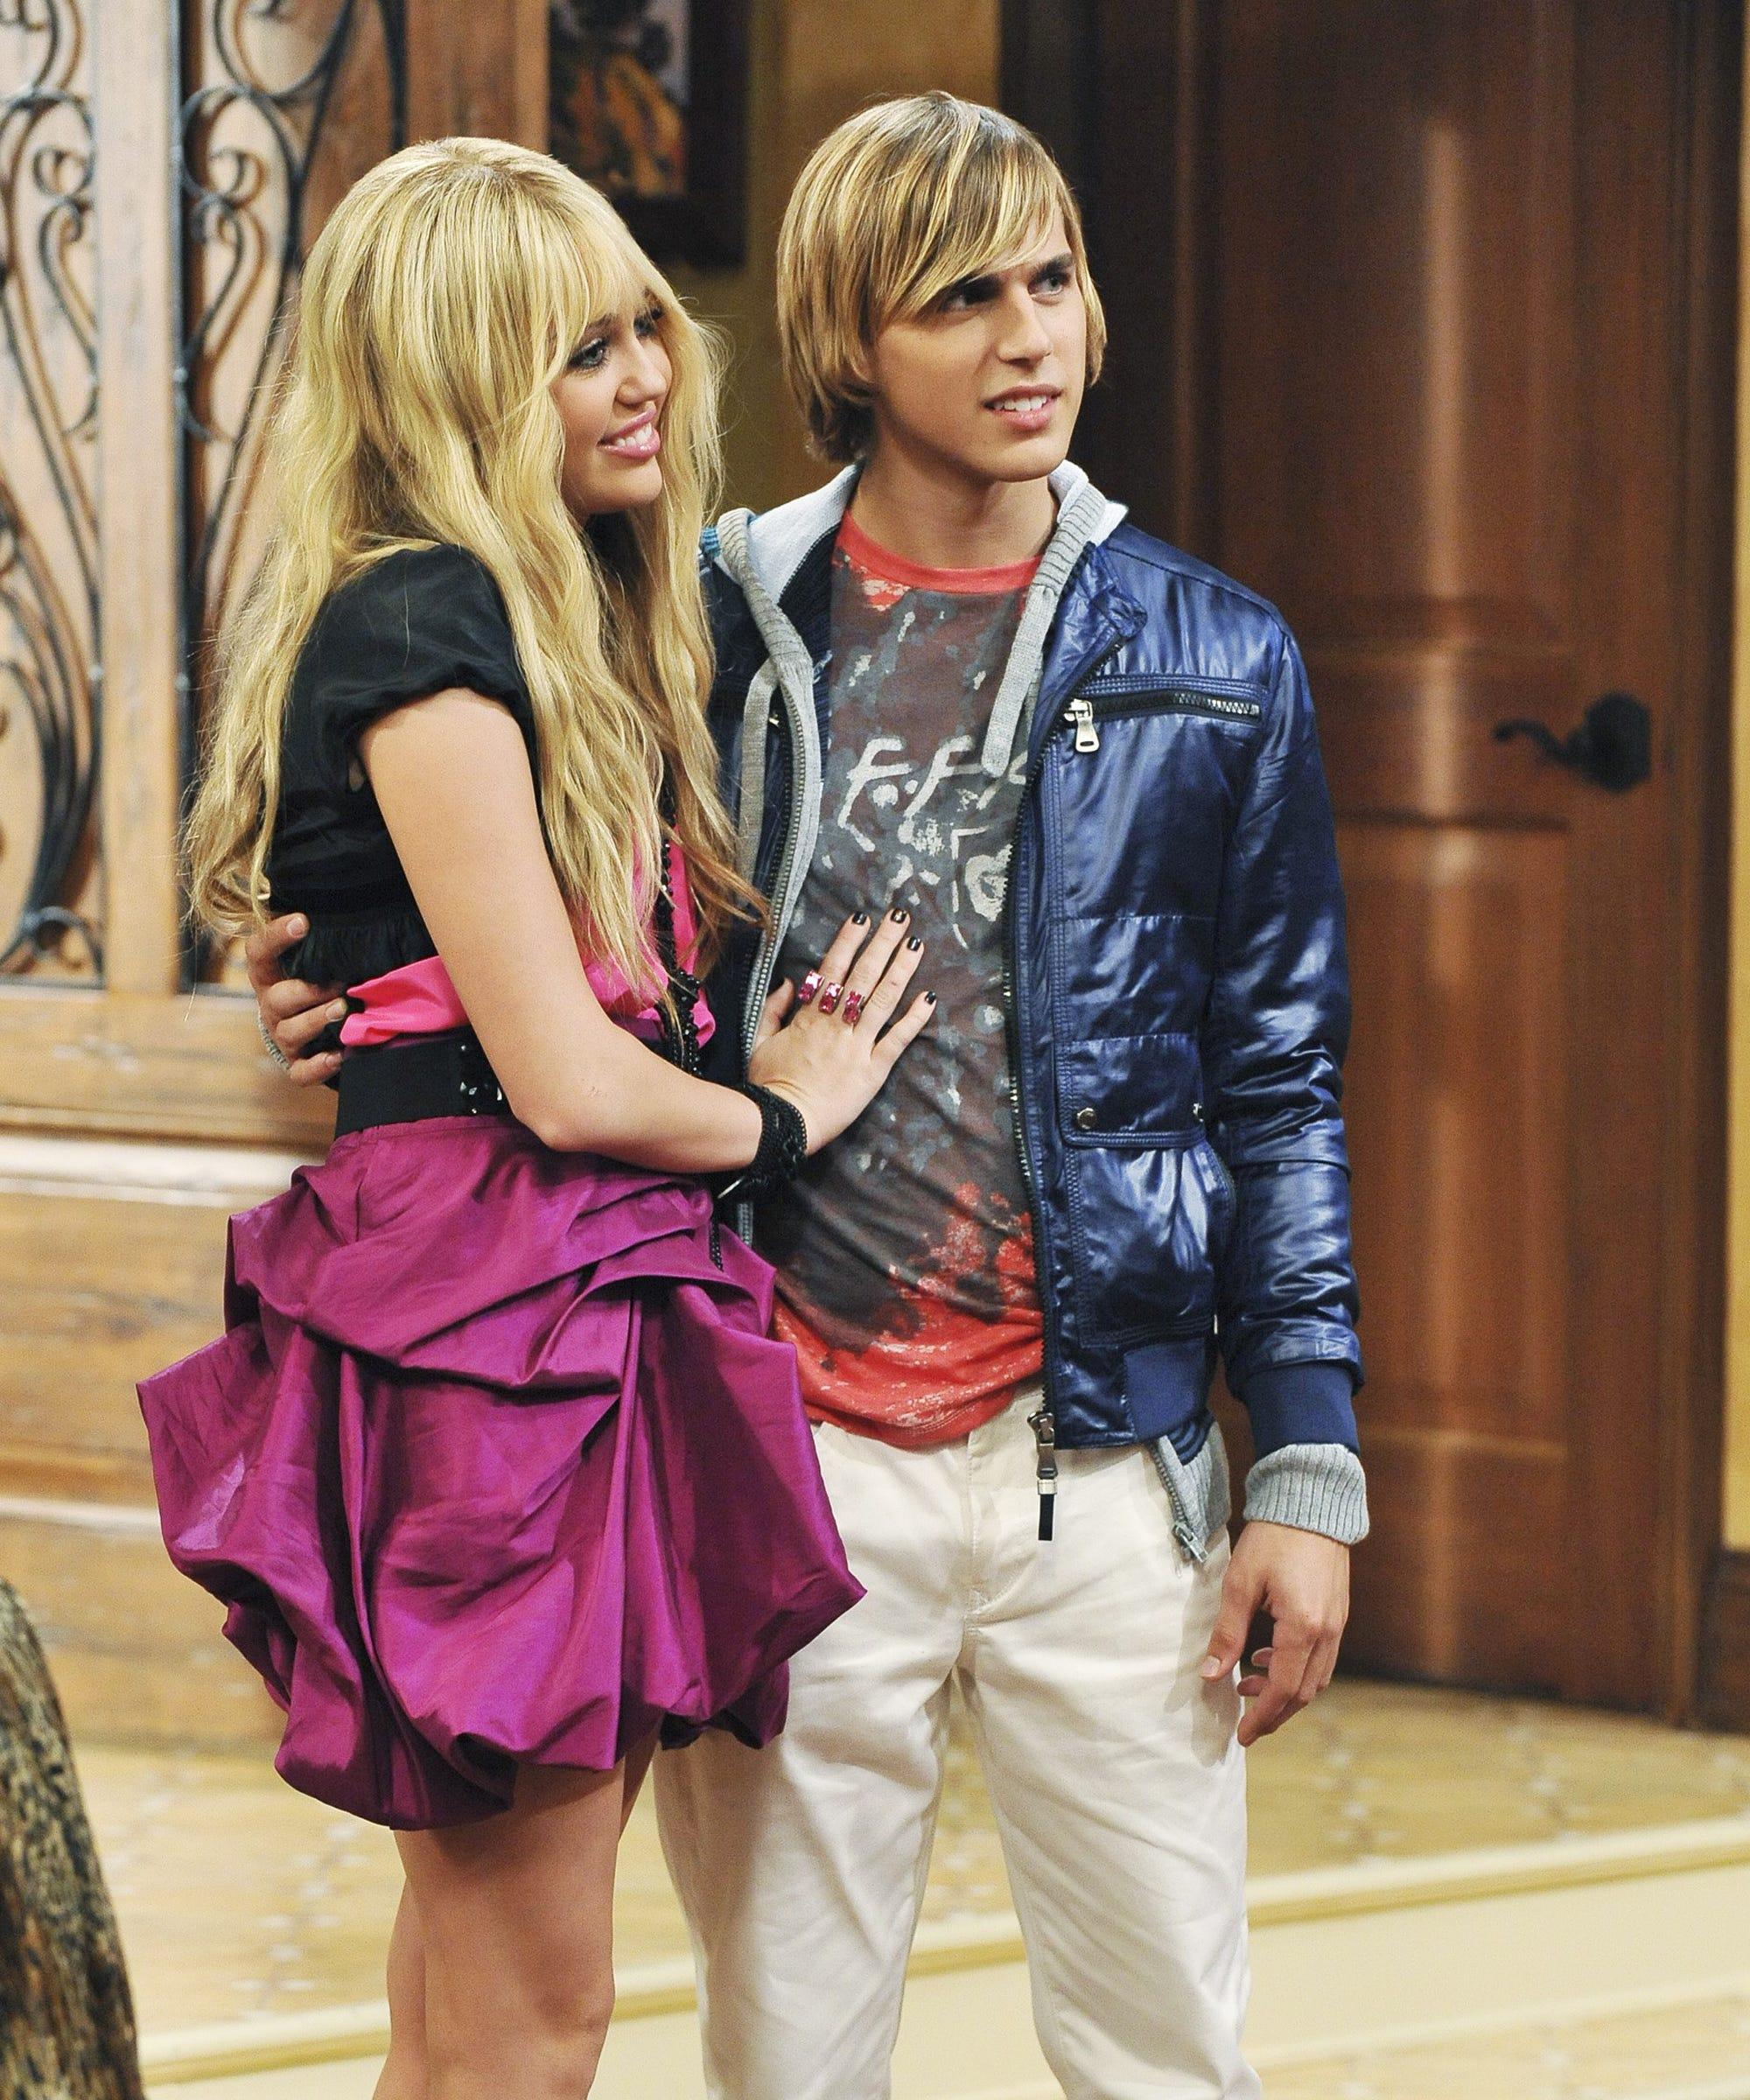 Cody Linley Miley Cyrus Hannah Montana Dating